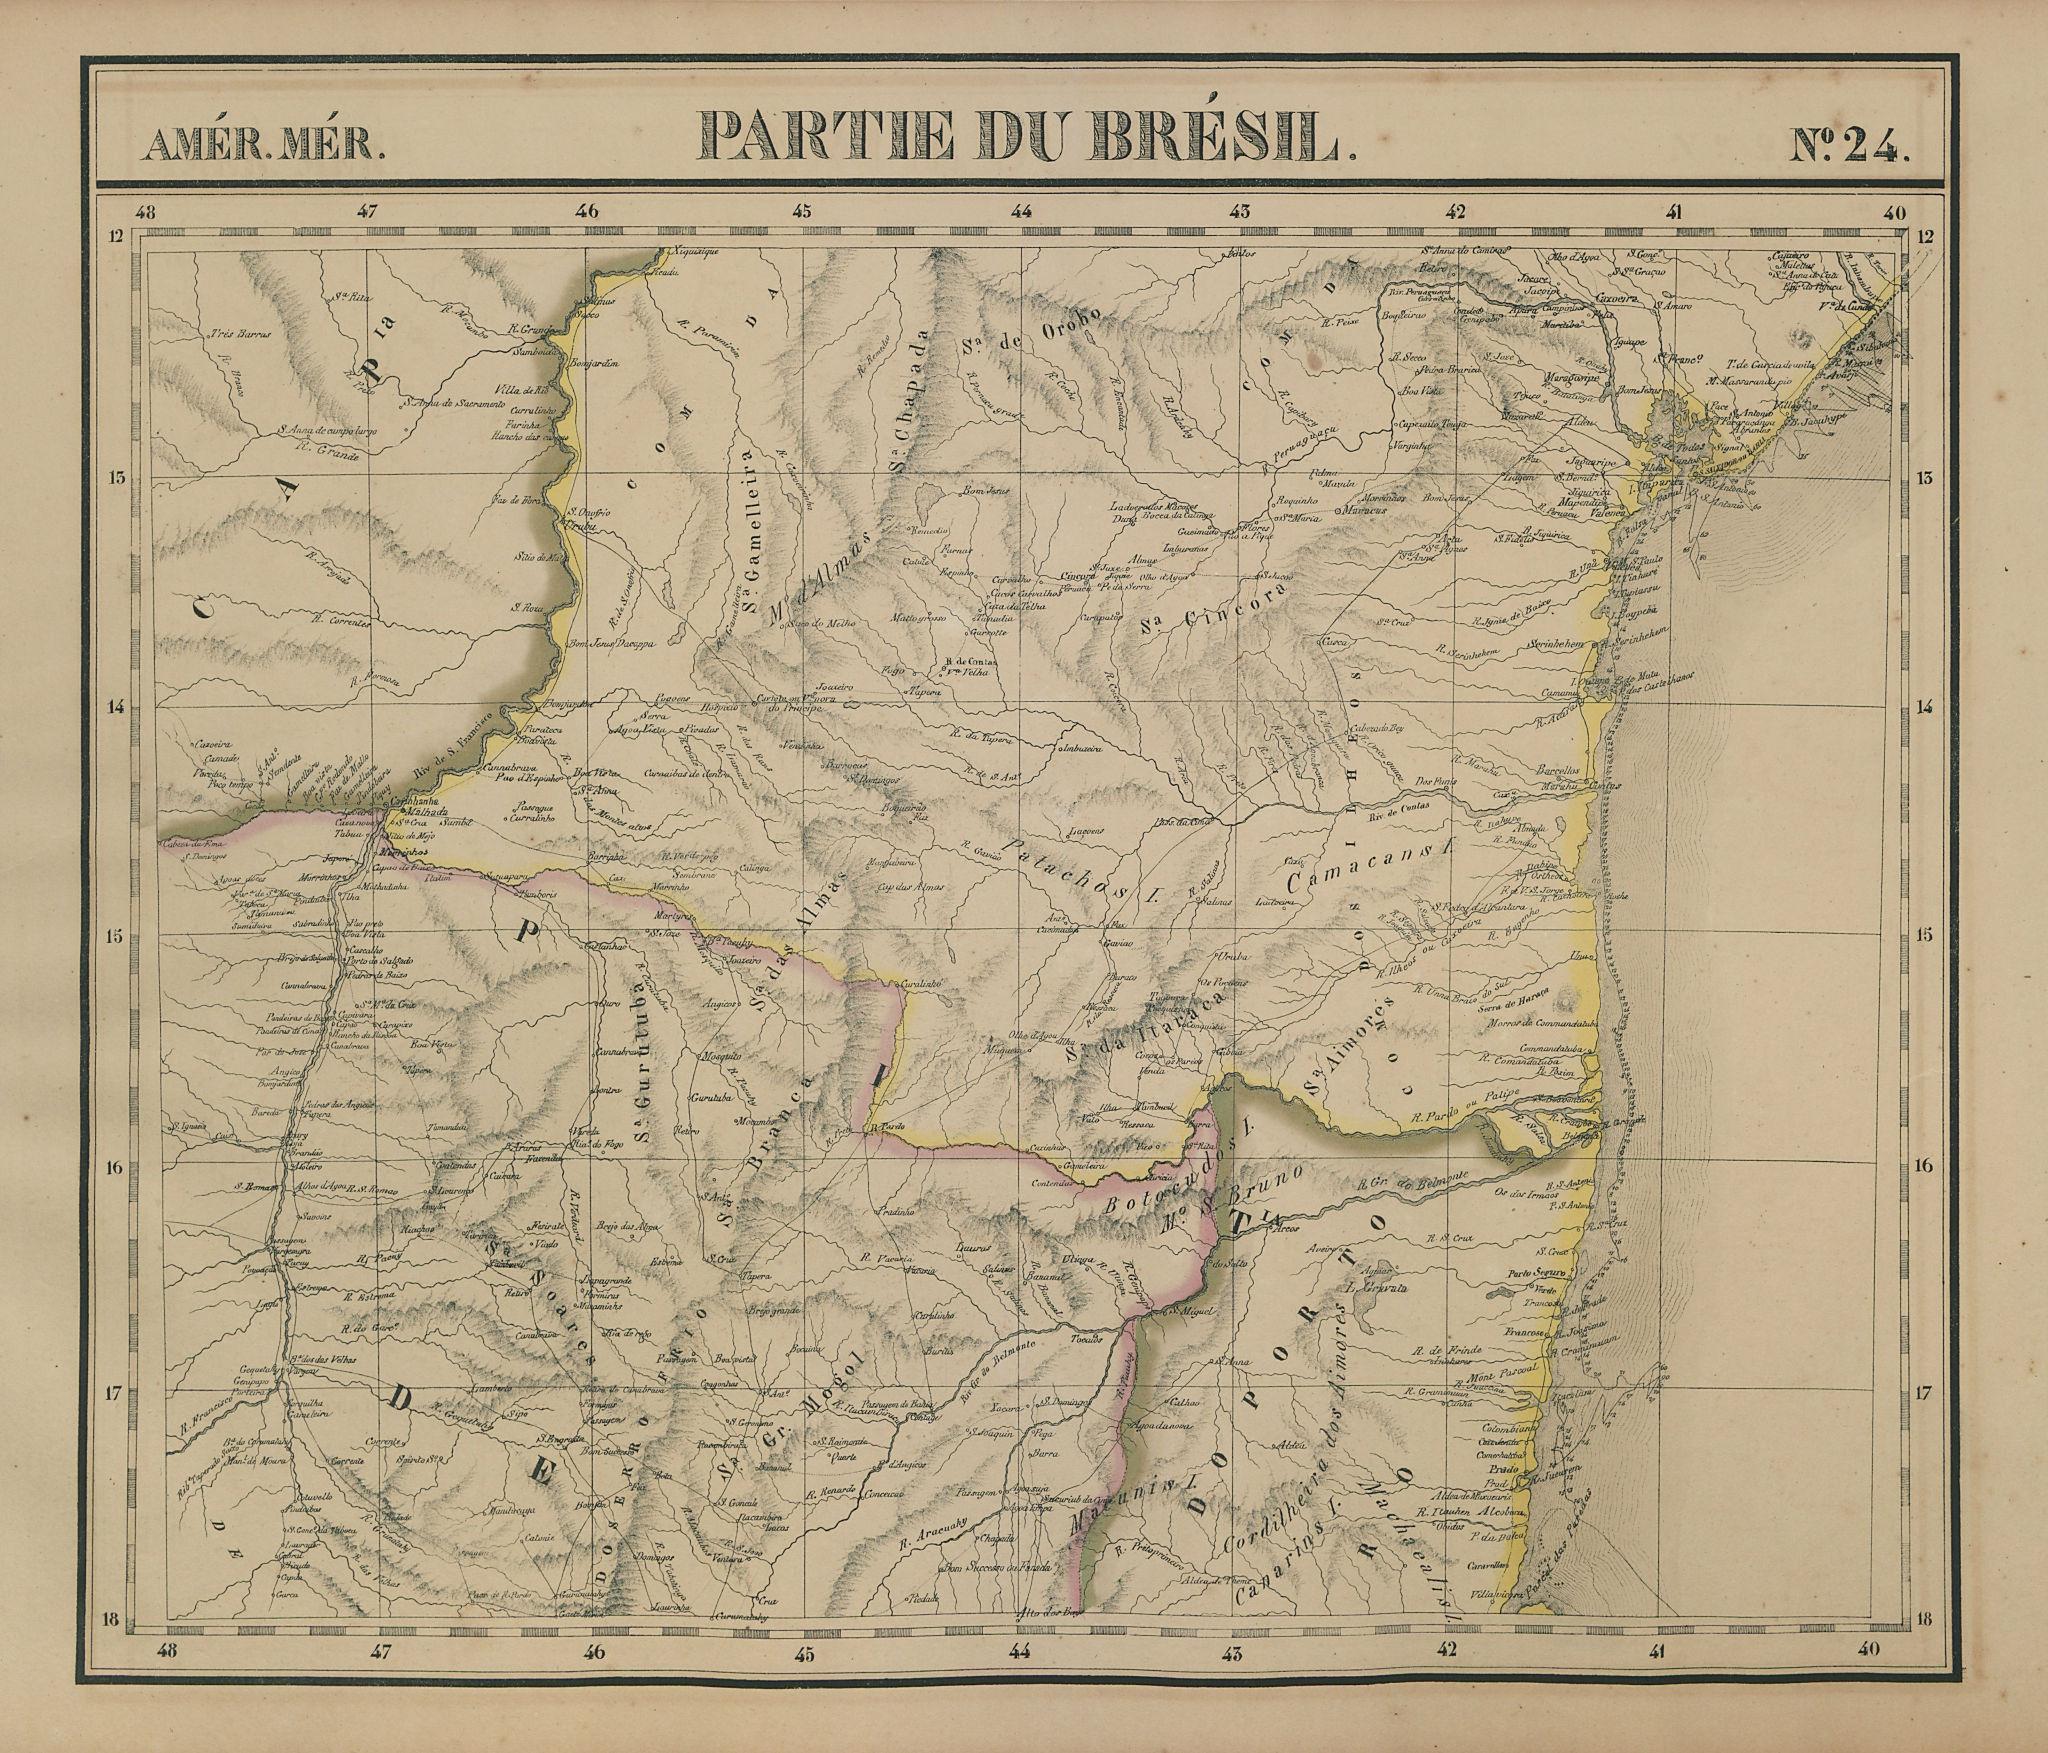 Amér. Mér. Brésil #24. Southern Bahia & NE Minas Gerais. VANDERMAELEN 1827 map